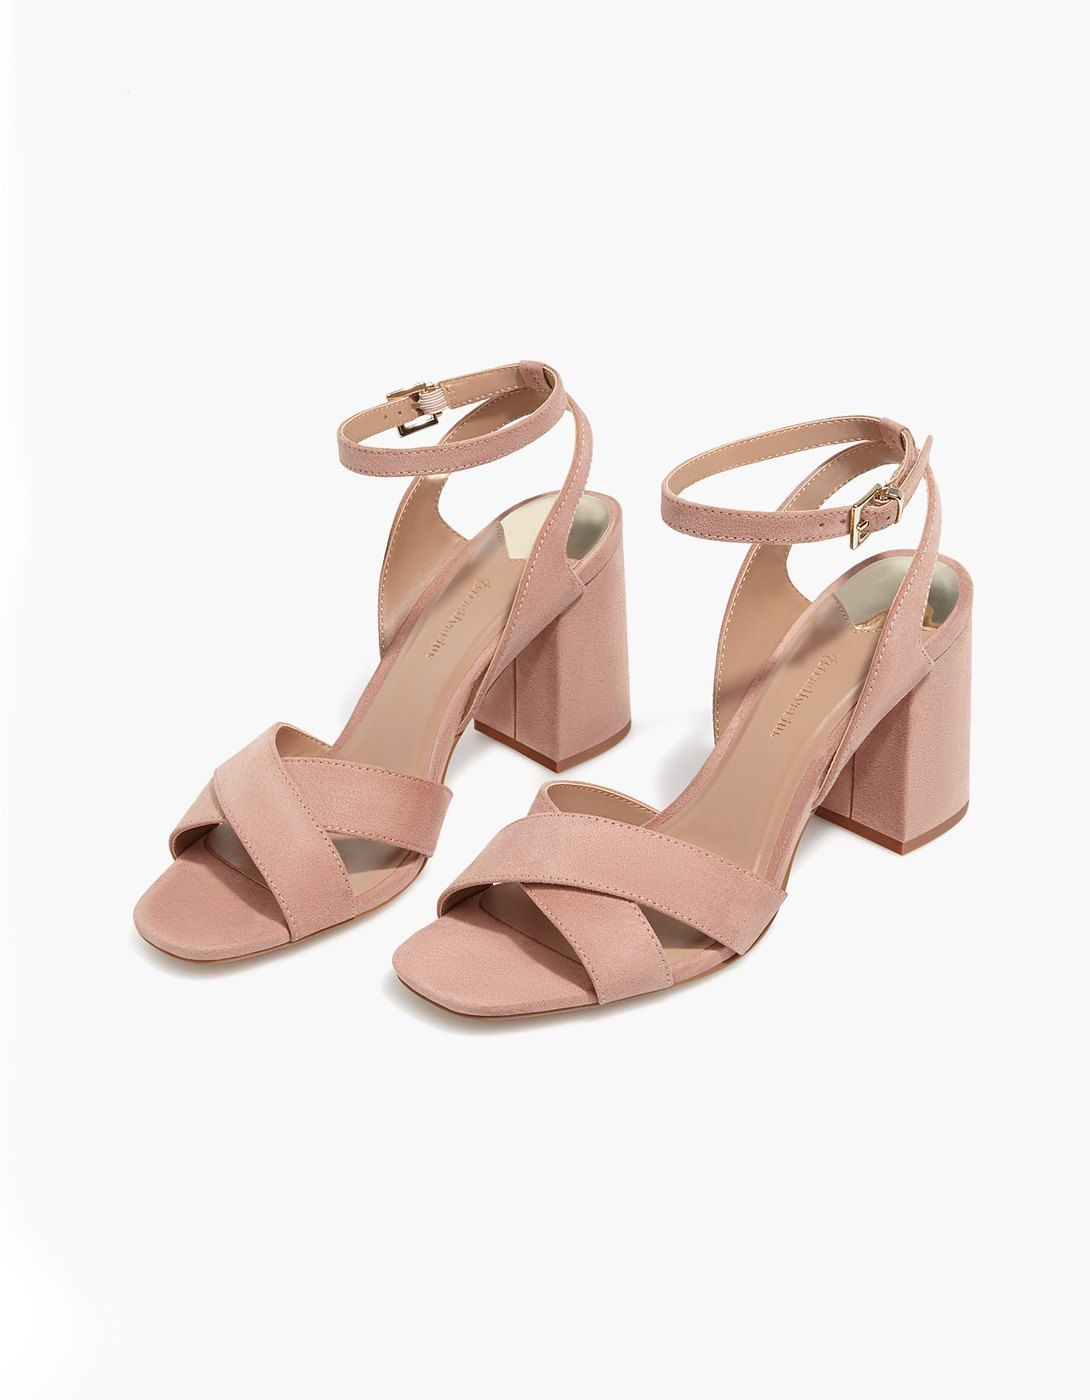 Addict Sandale France ToutesStradivarius Talon Shoes Nude 0X8wNnPZOk